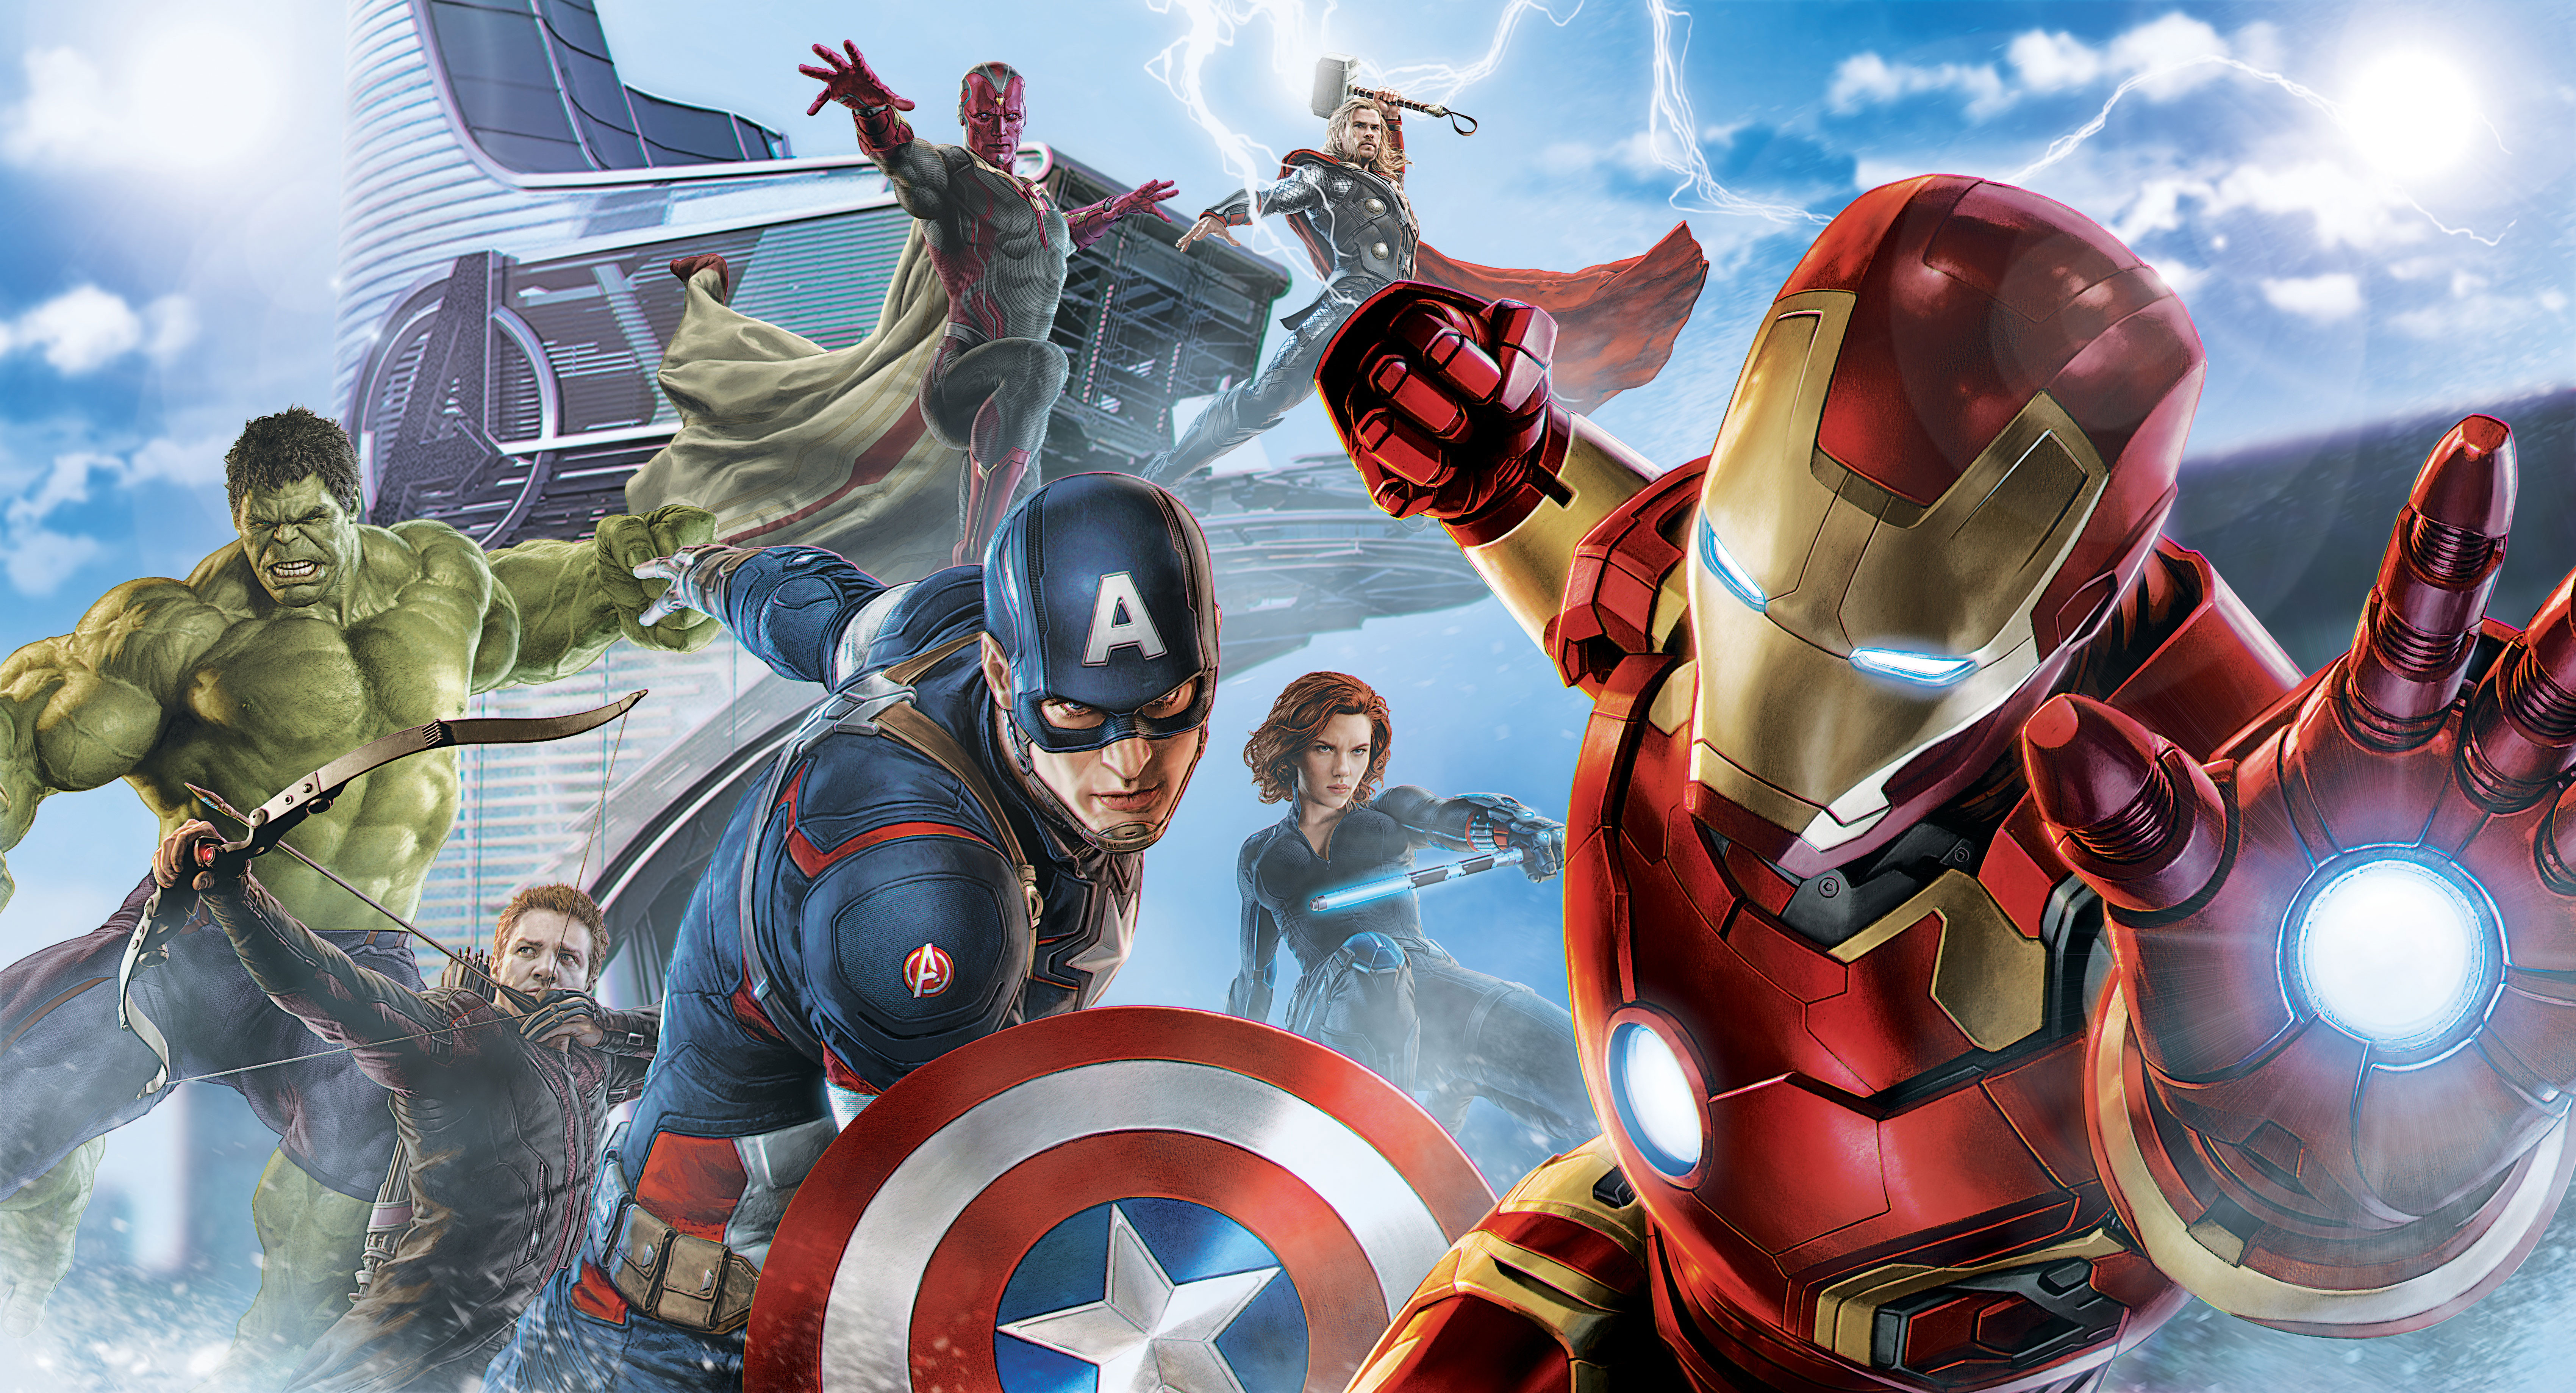 Avengers Artwork 5k, HD Superheroes, 4k Wallpapers, Images ...